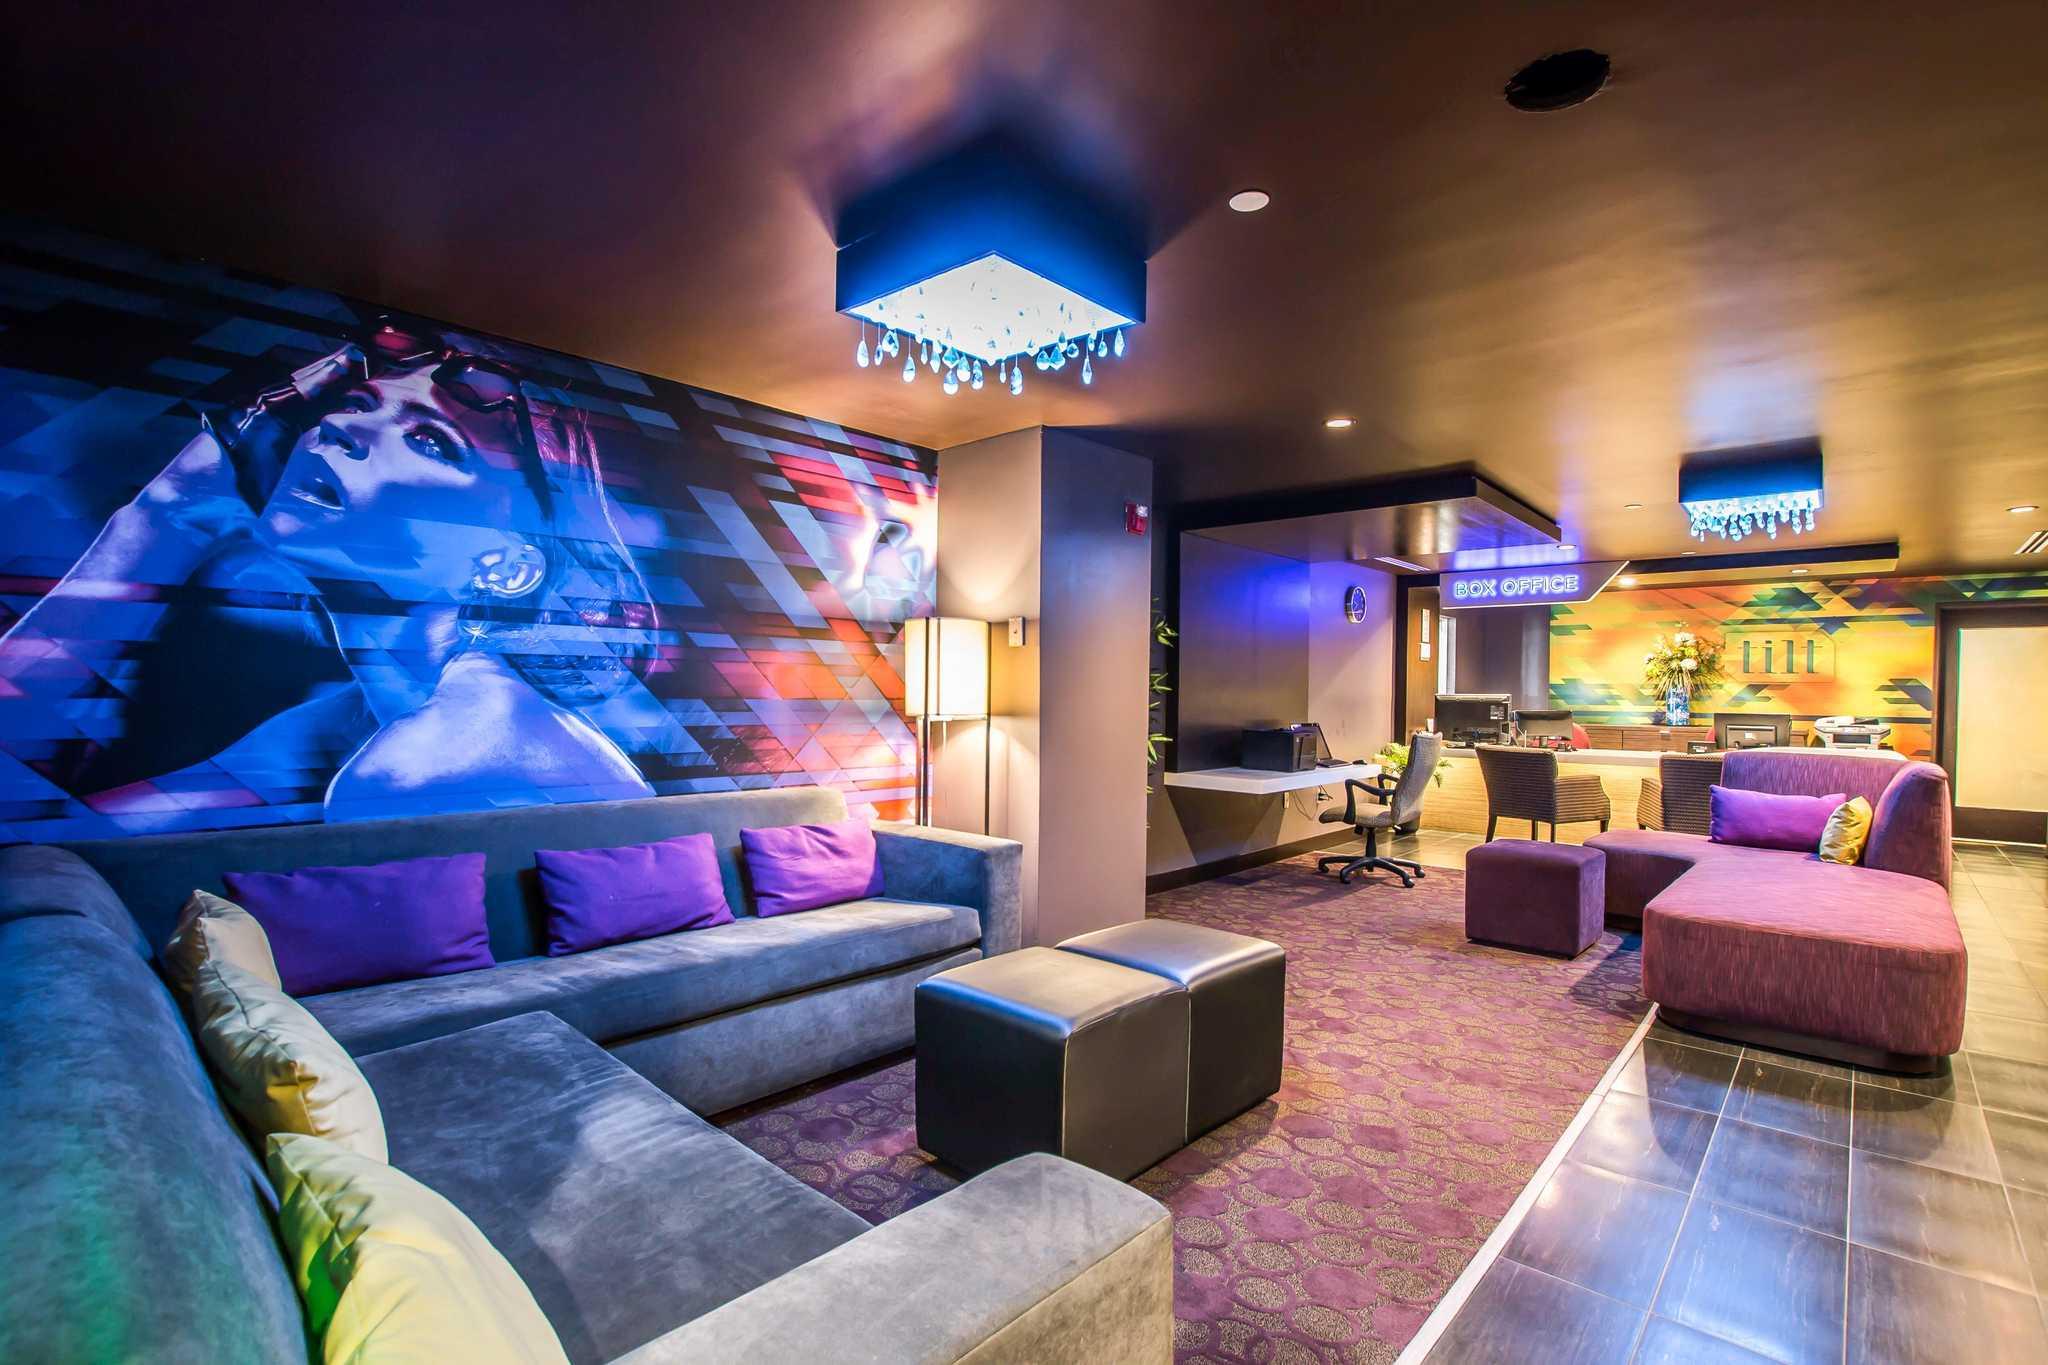 Hotels near Universal Studios LA | SpringHill Suites Los